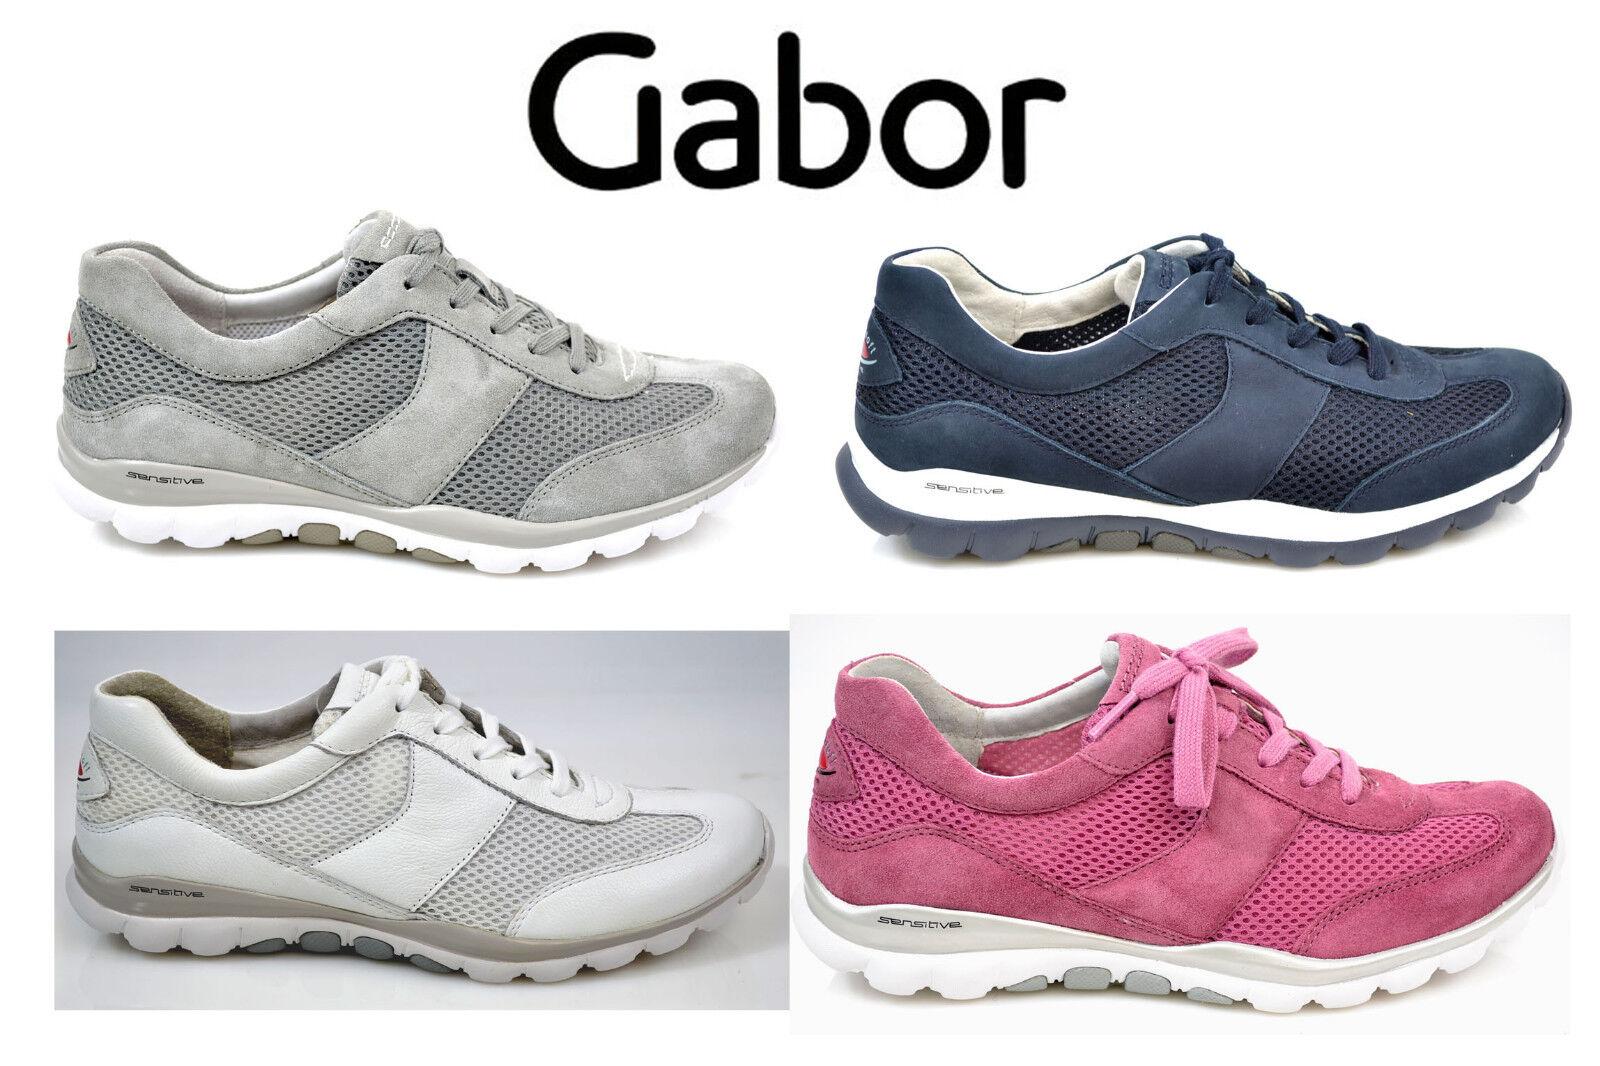 Gabor Comfort Rollingsoft Damen Sneaker Schuhe nightblue fumo hellgrau 86.966.46